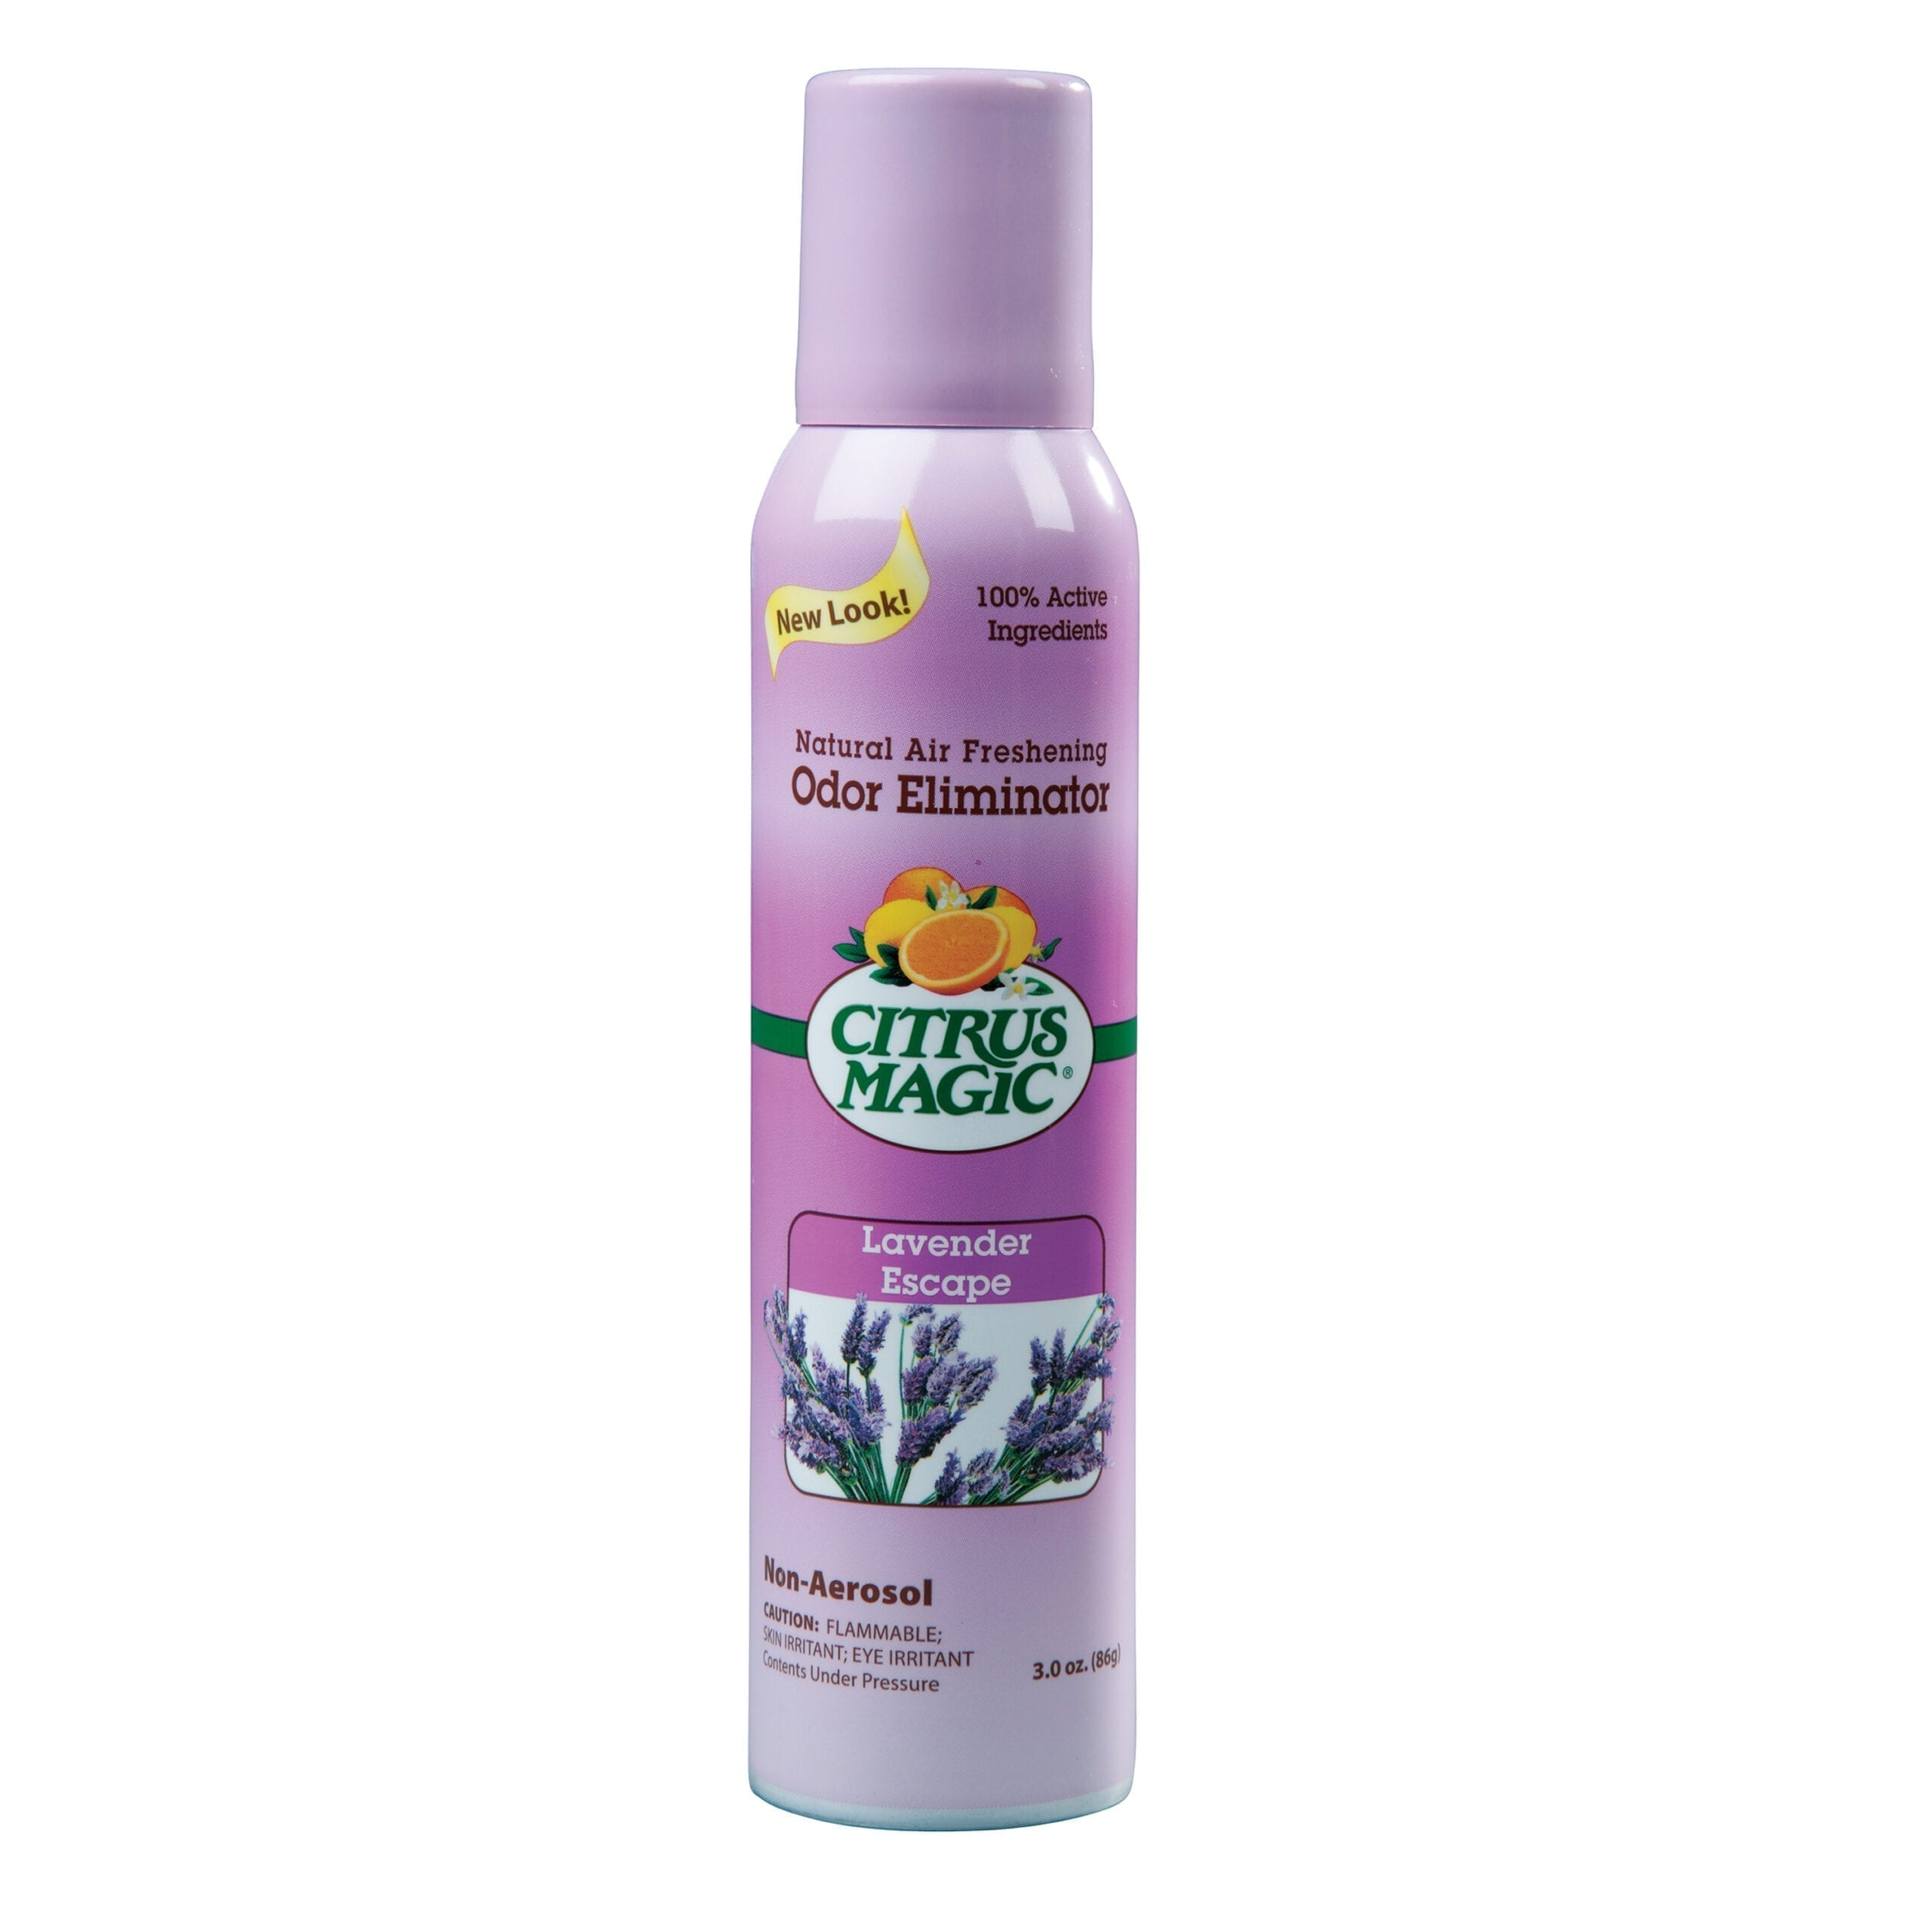 Citrus Magic Natural Odor Eliminating Air Freshener Spray, Lavender Escape